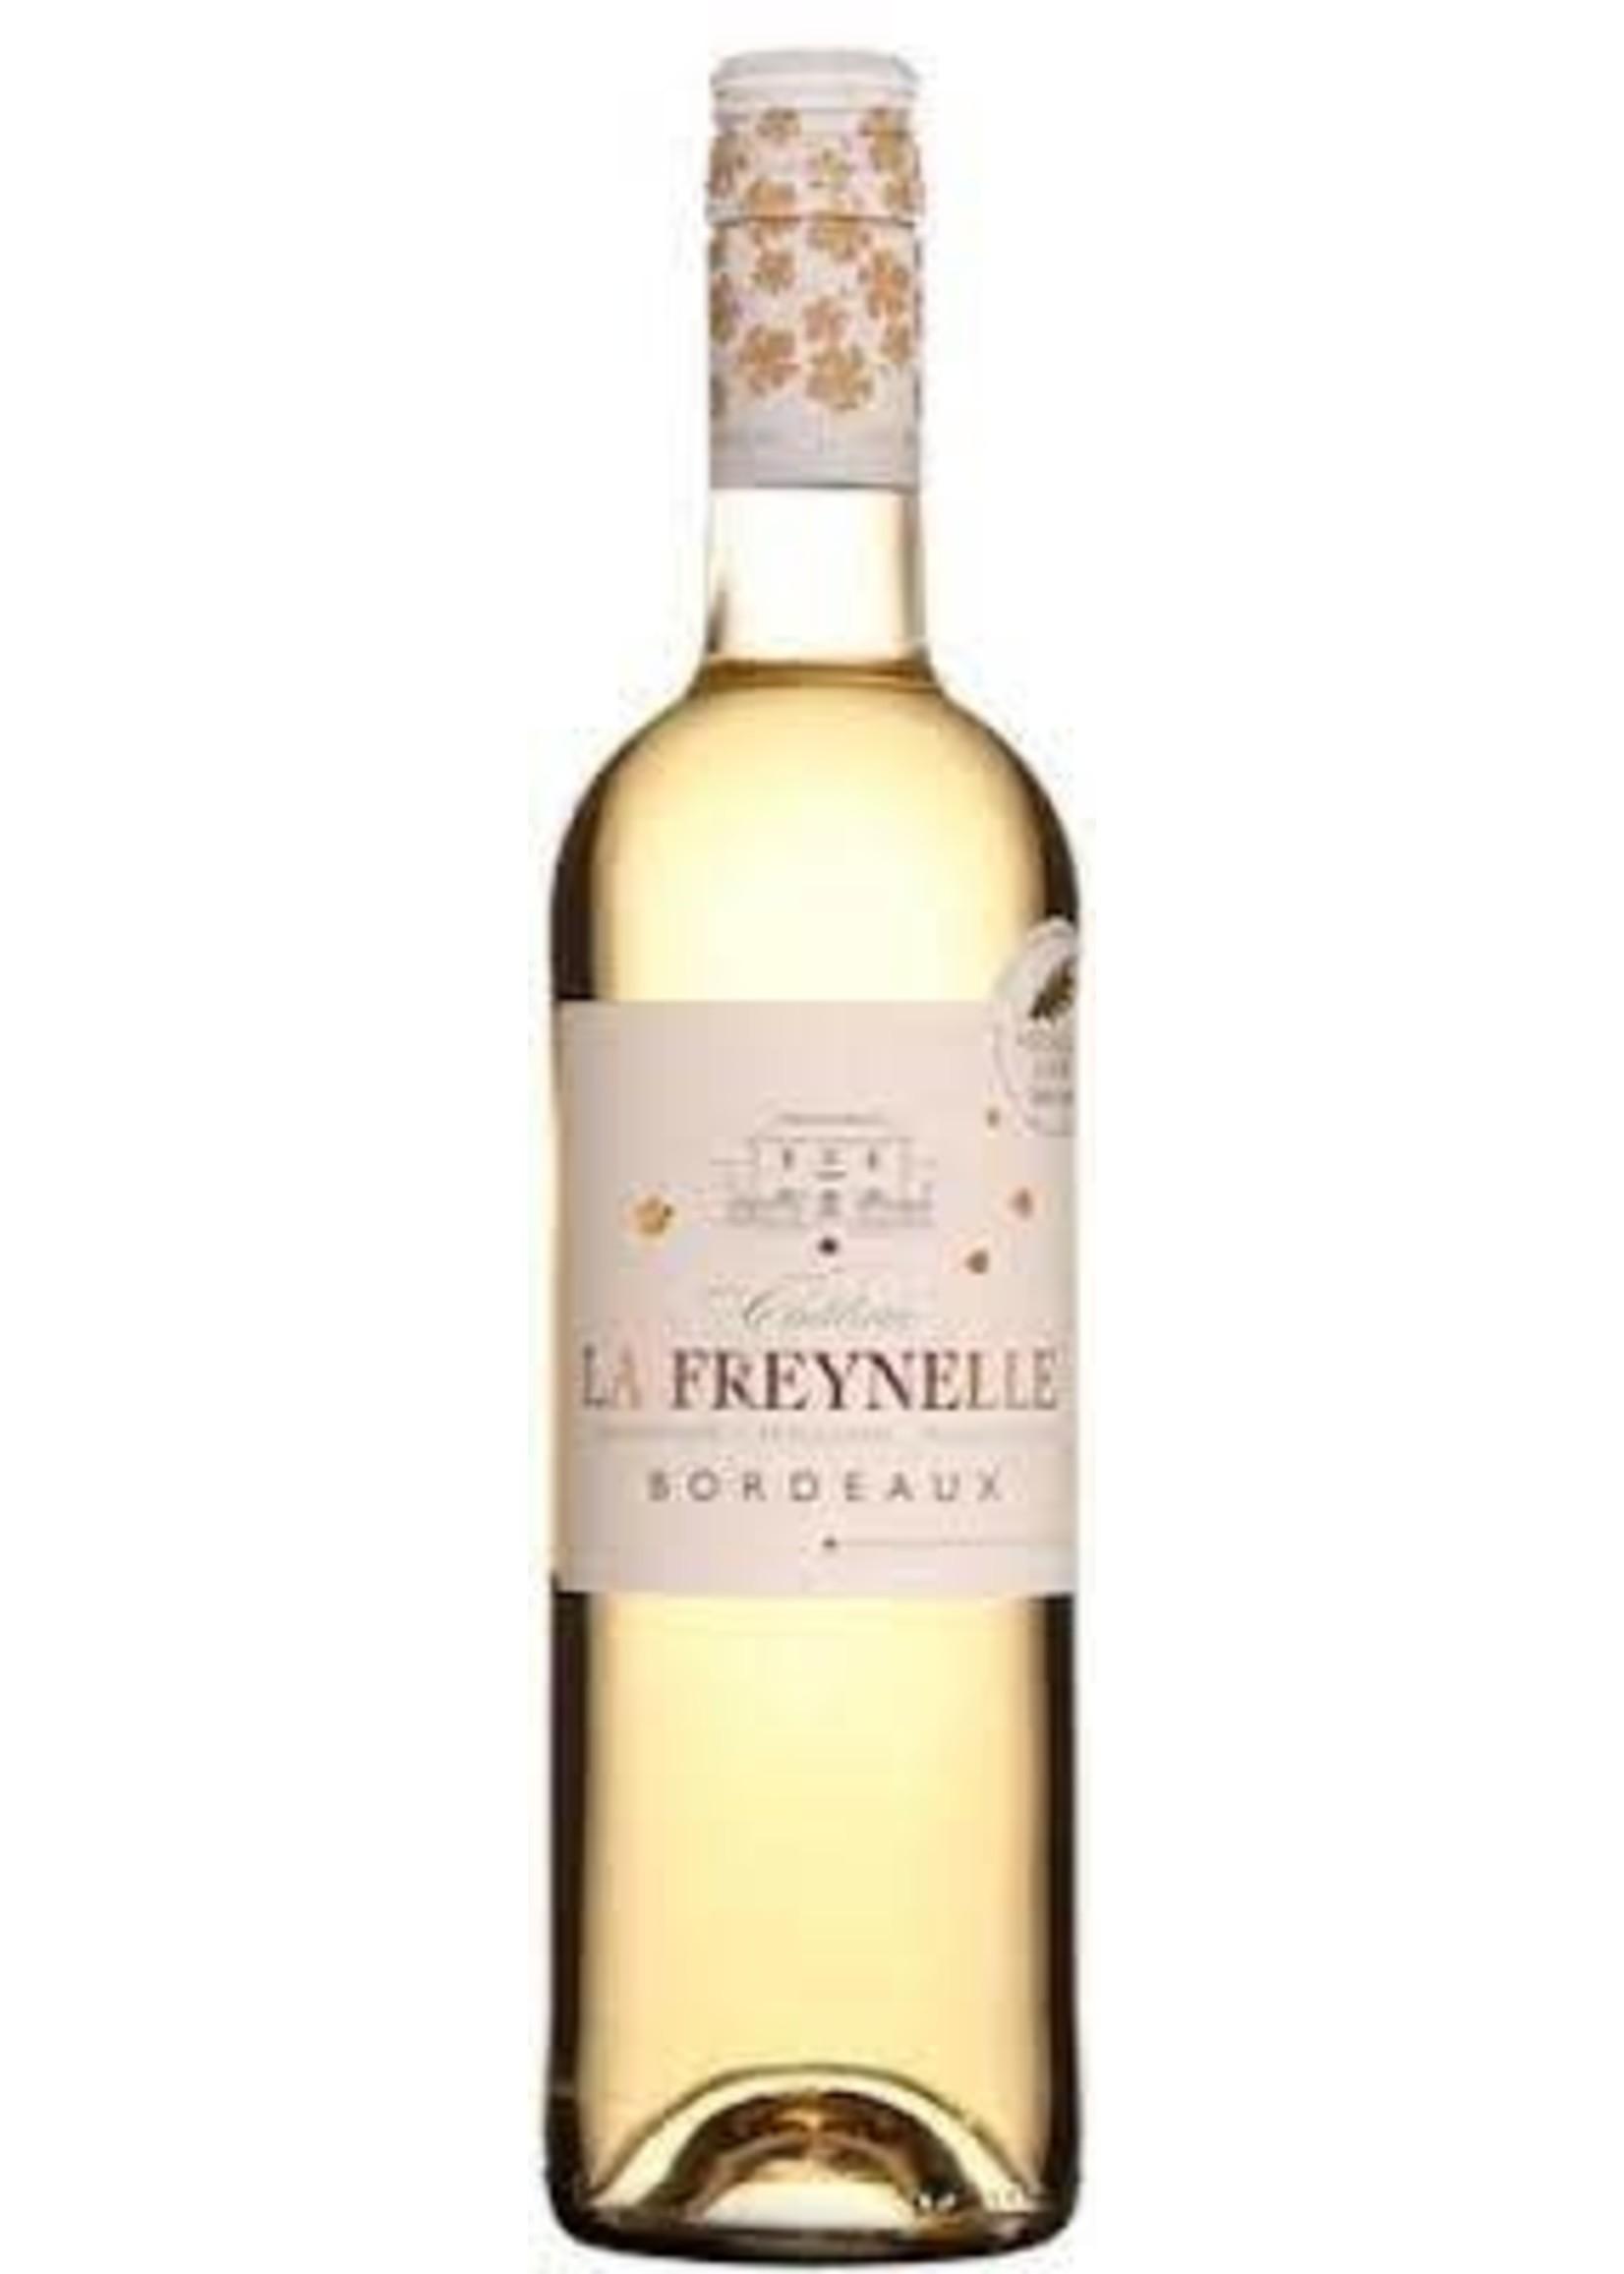 Chateau la Freynelle 2020 Bordeaux Blanc 750ml